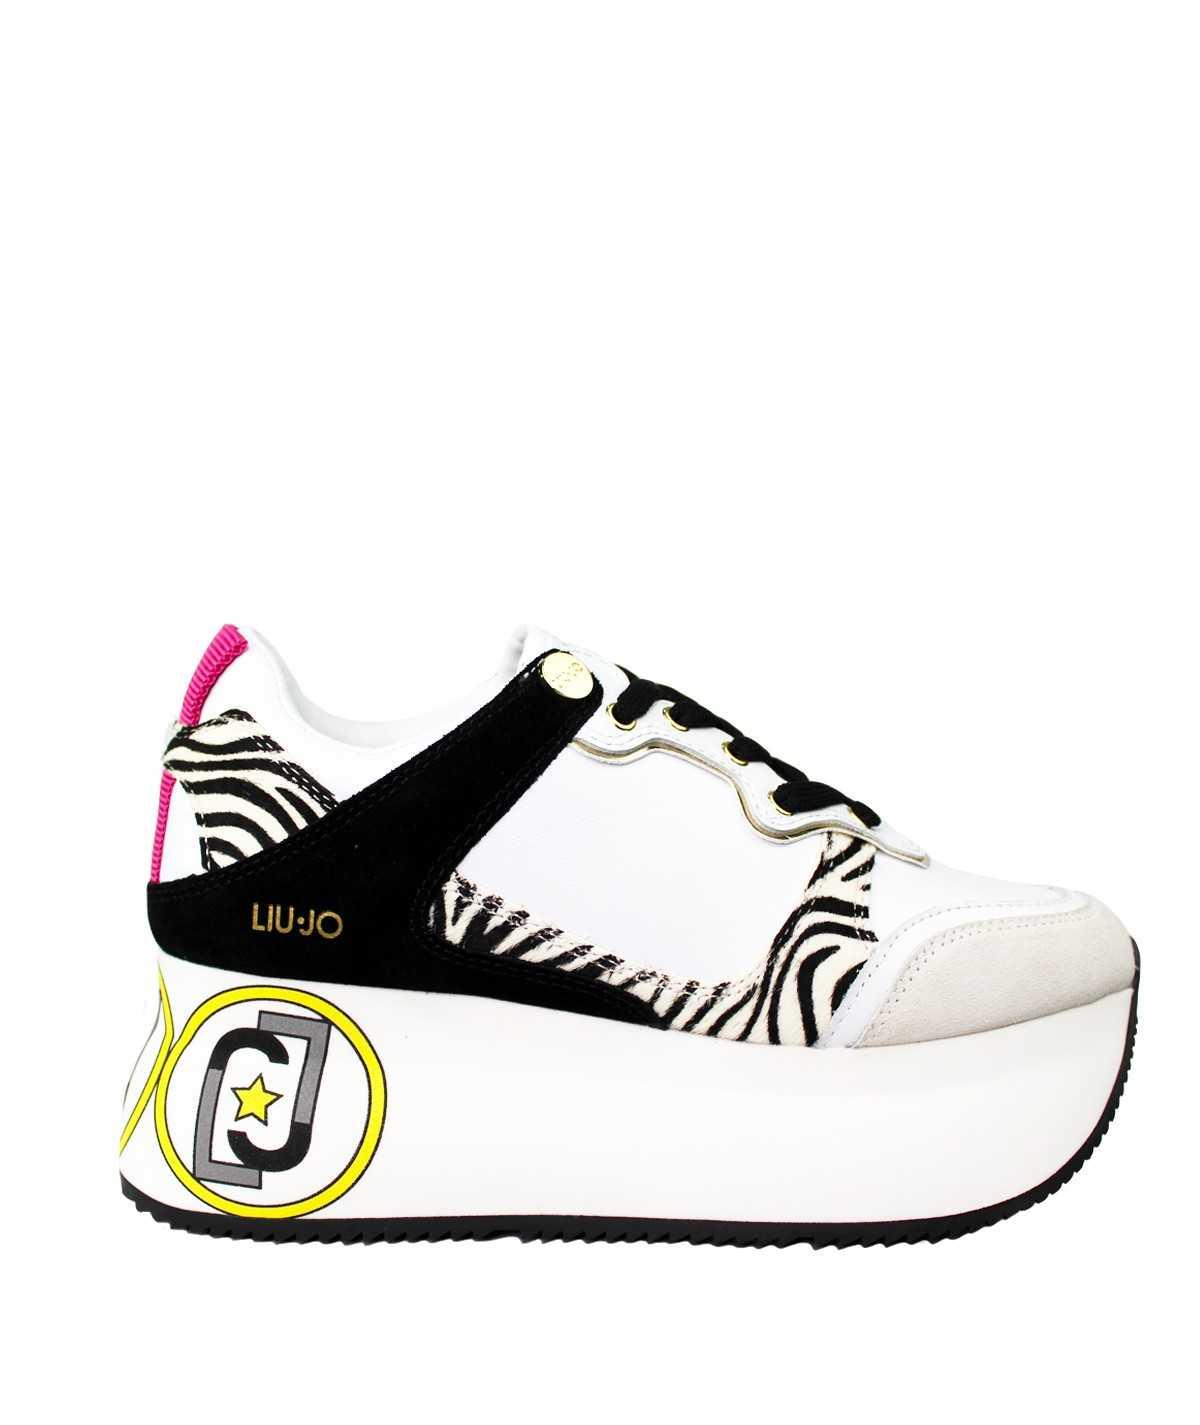 LIU JO Sneakers maxi...